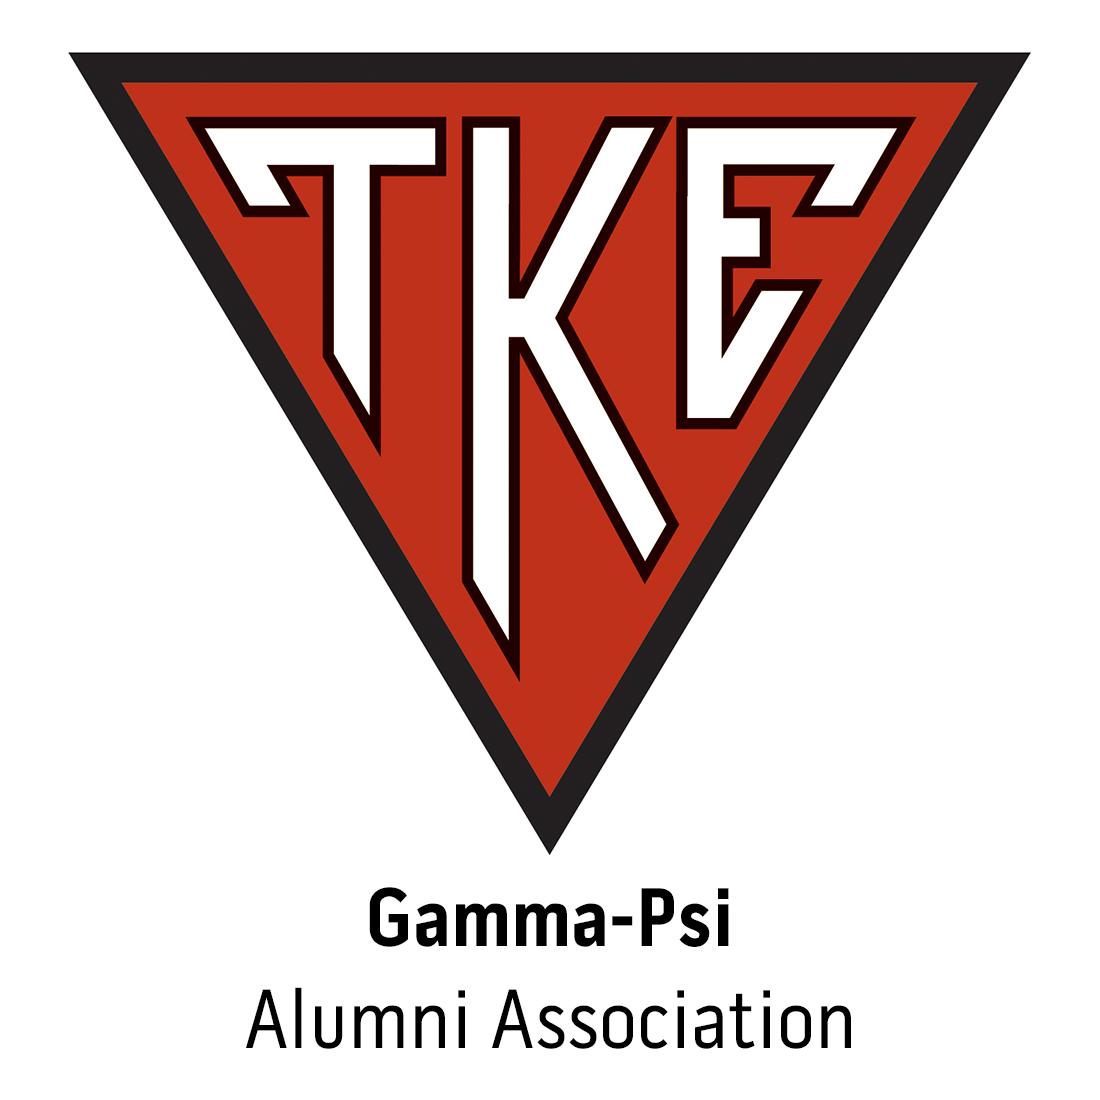 Gamma-Psi Alumni Association for Butler University